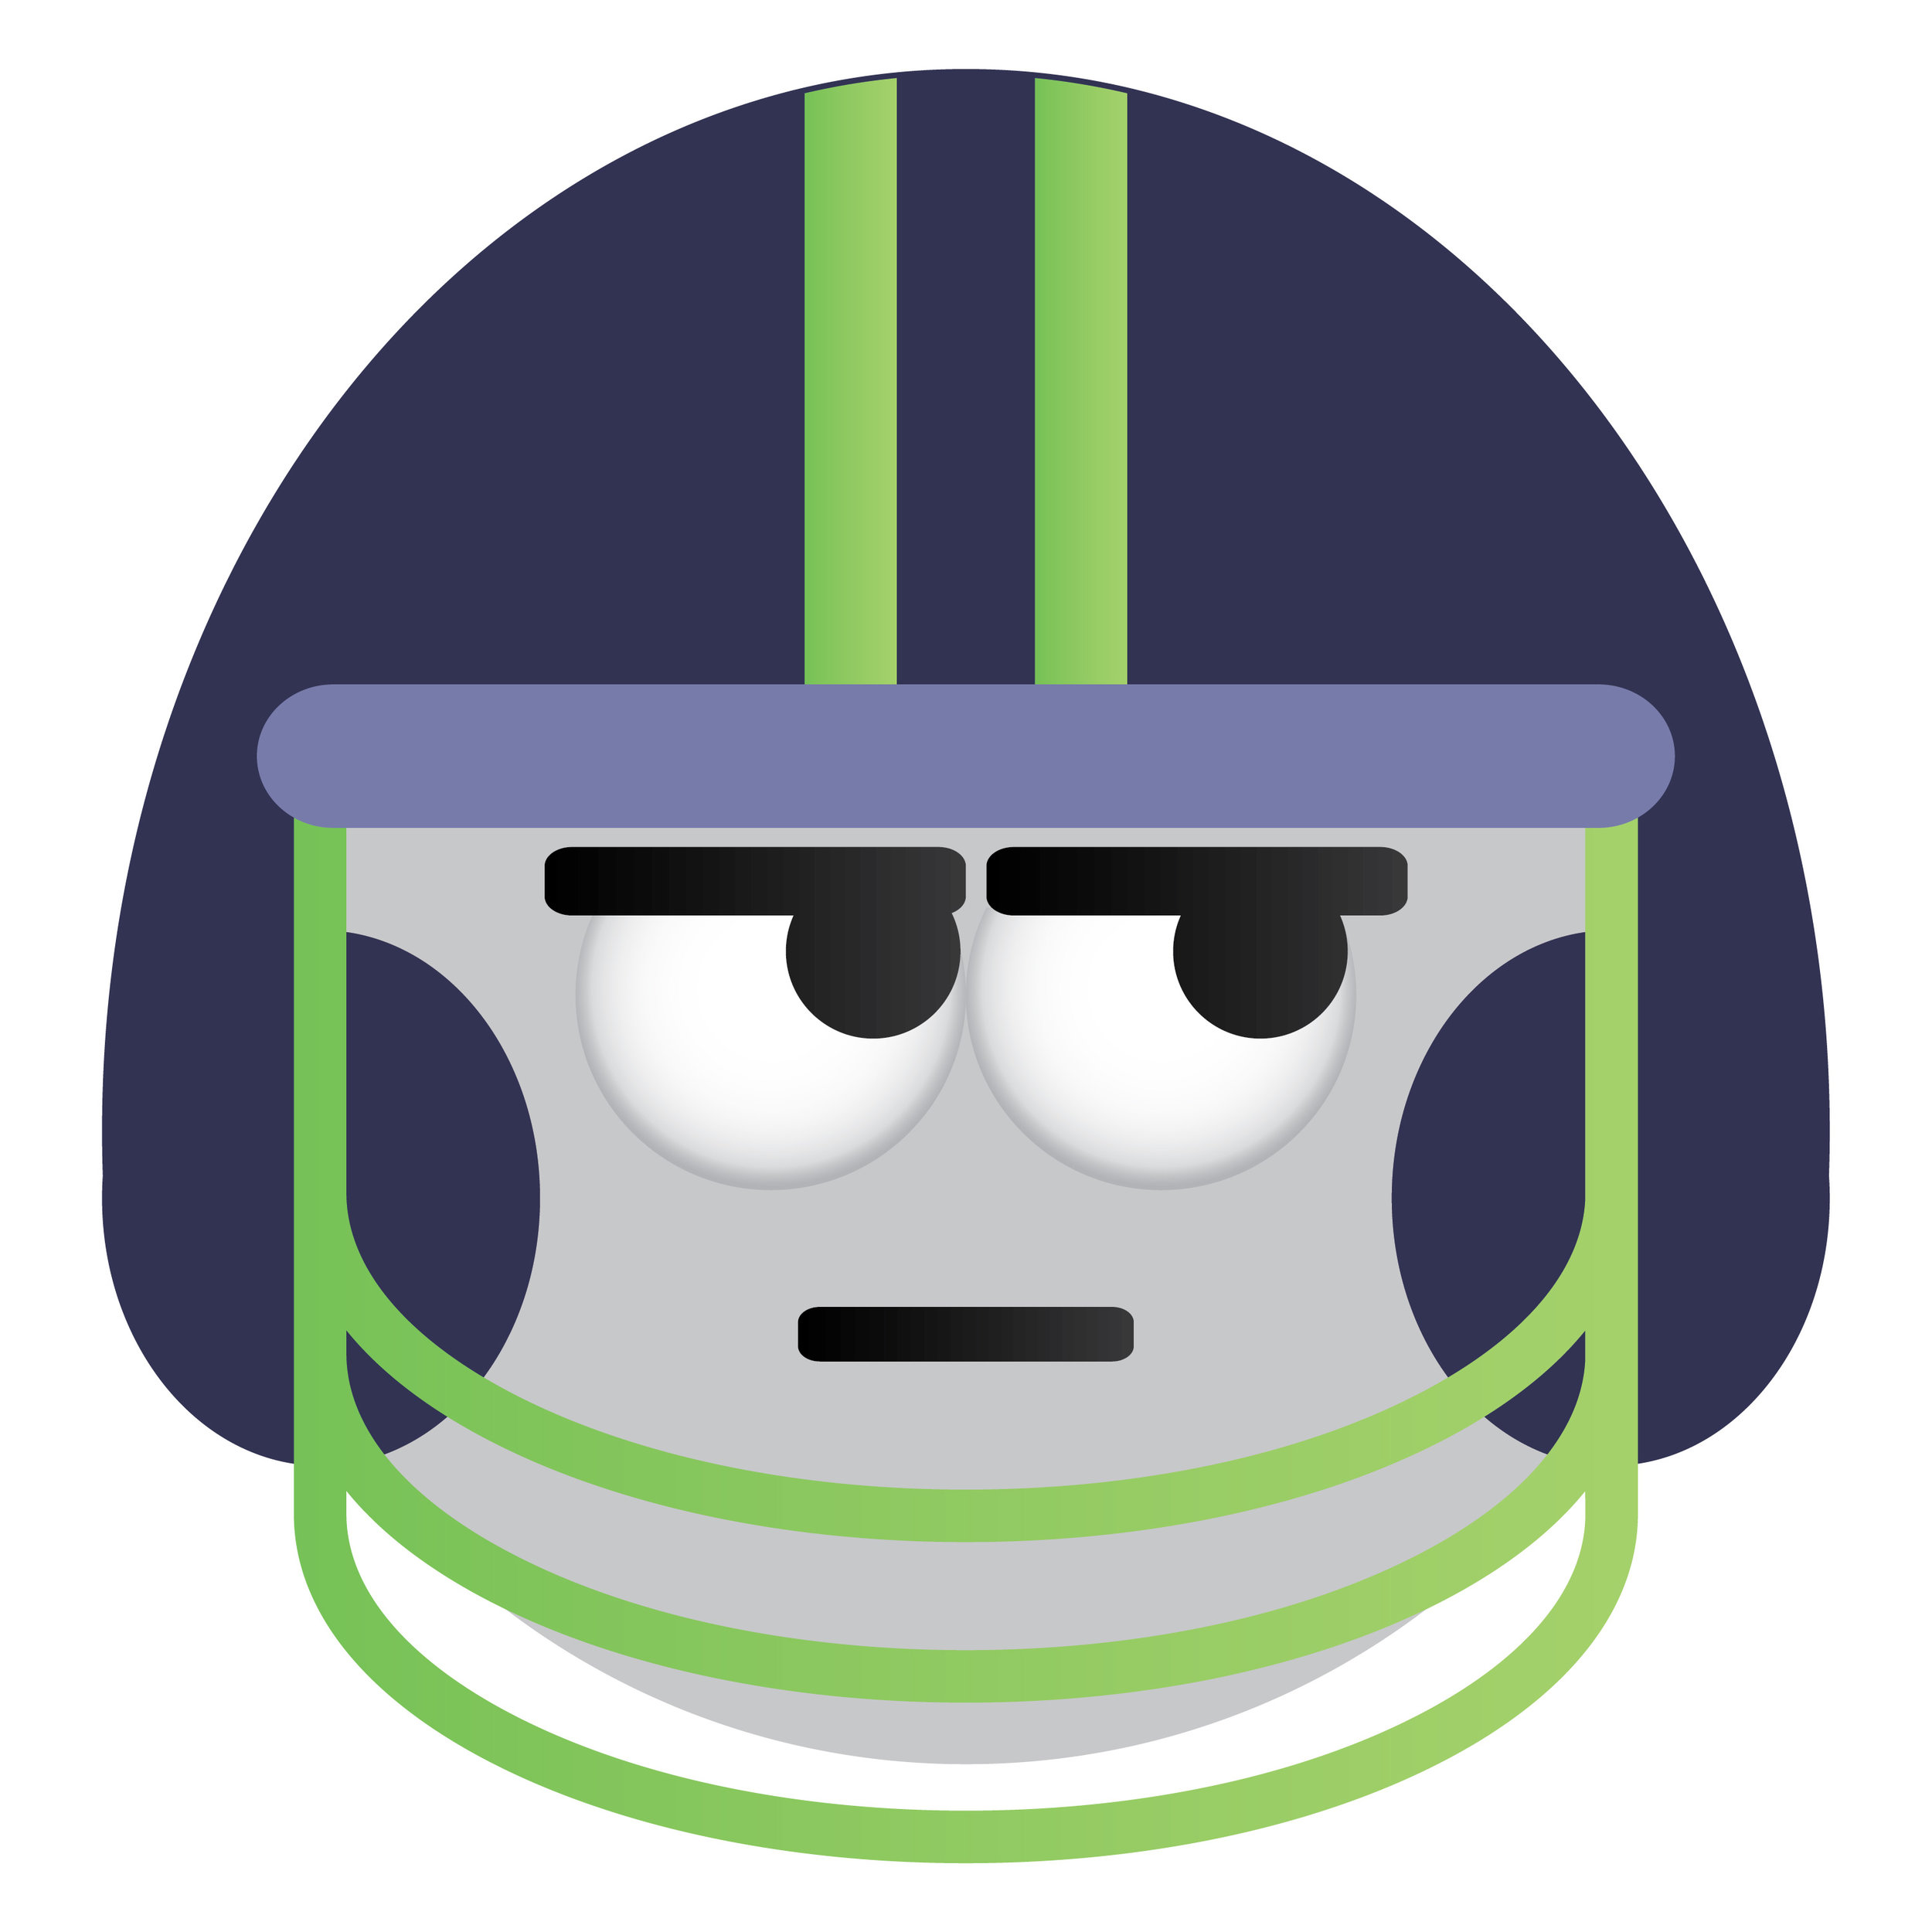 Emojis_Fall2018 [Recovered]_DM_Emoji_10.jpg